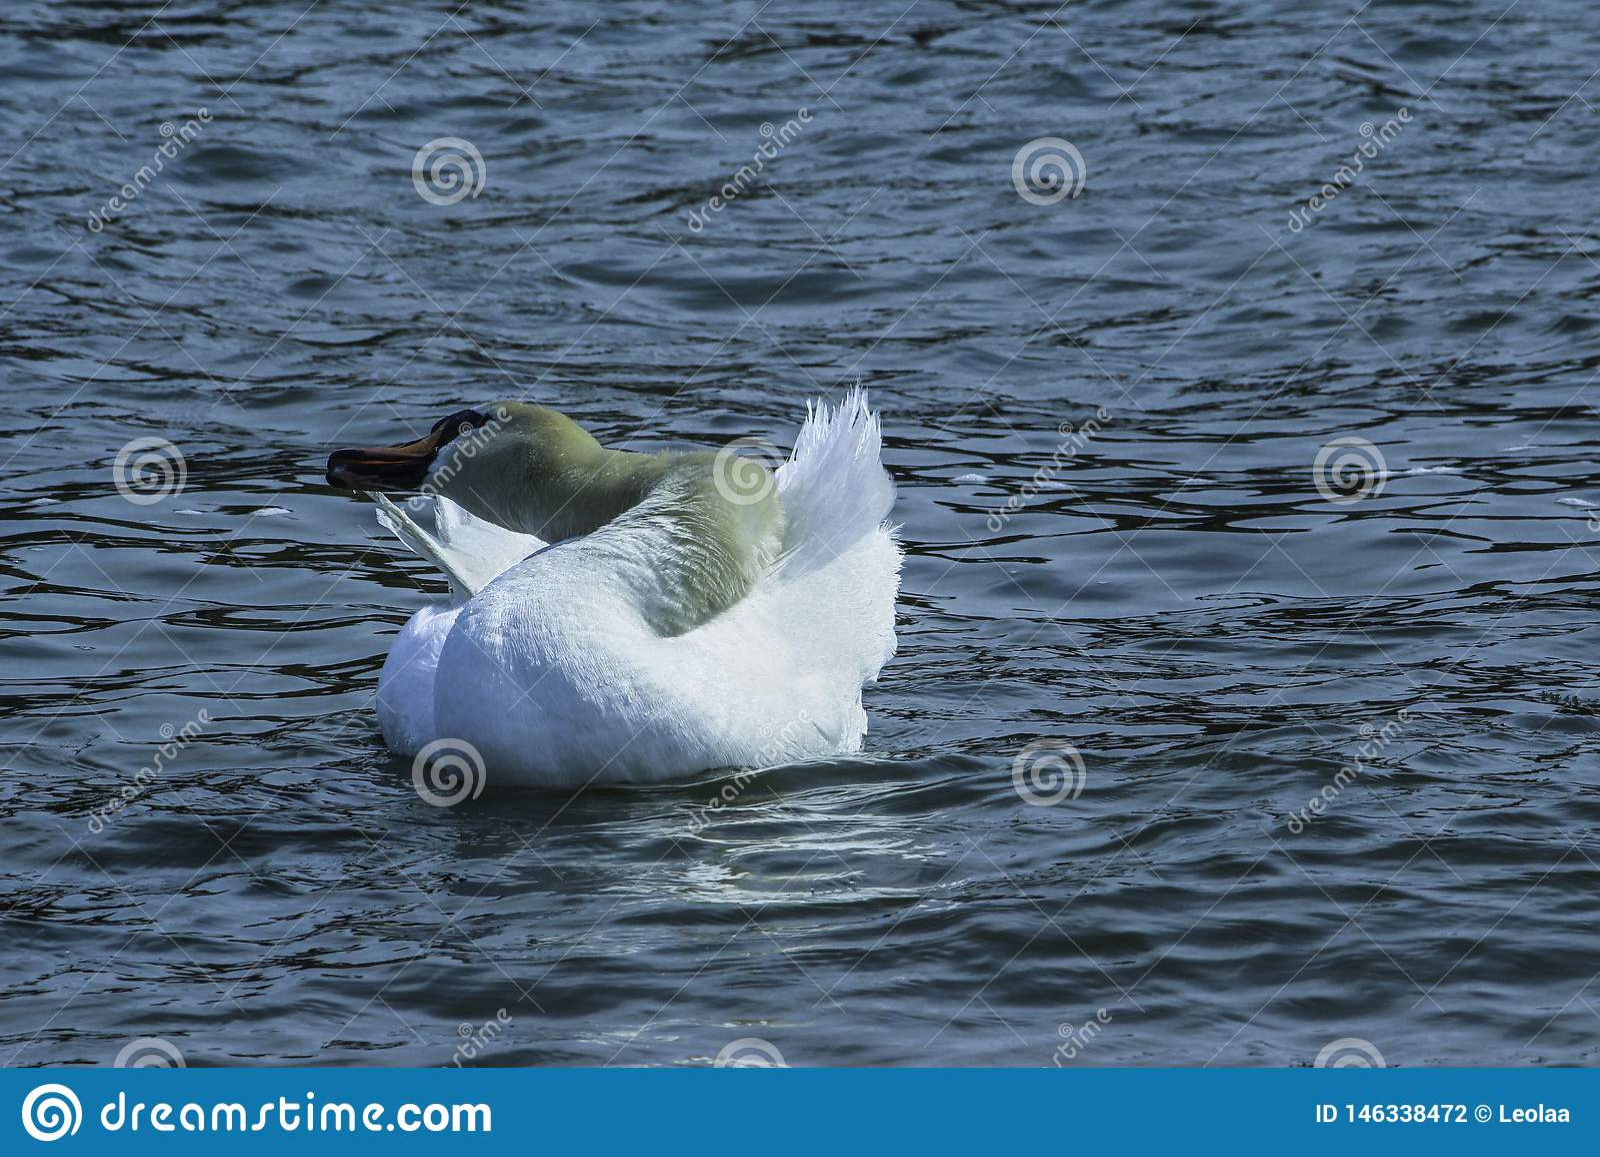 Swan Preening In The Lake